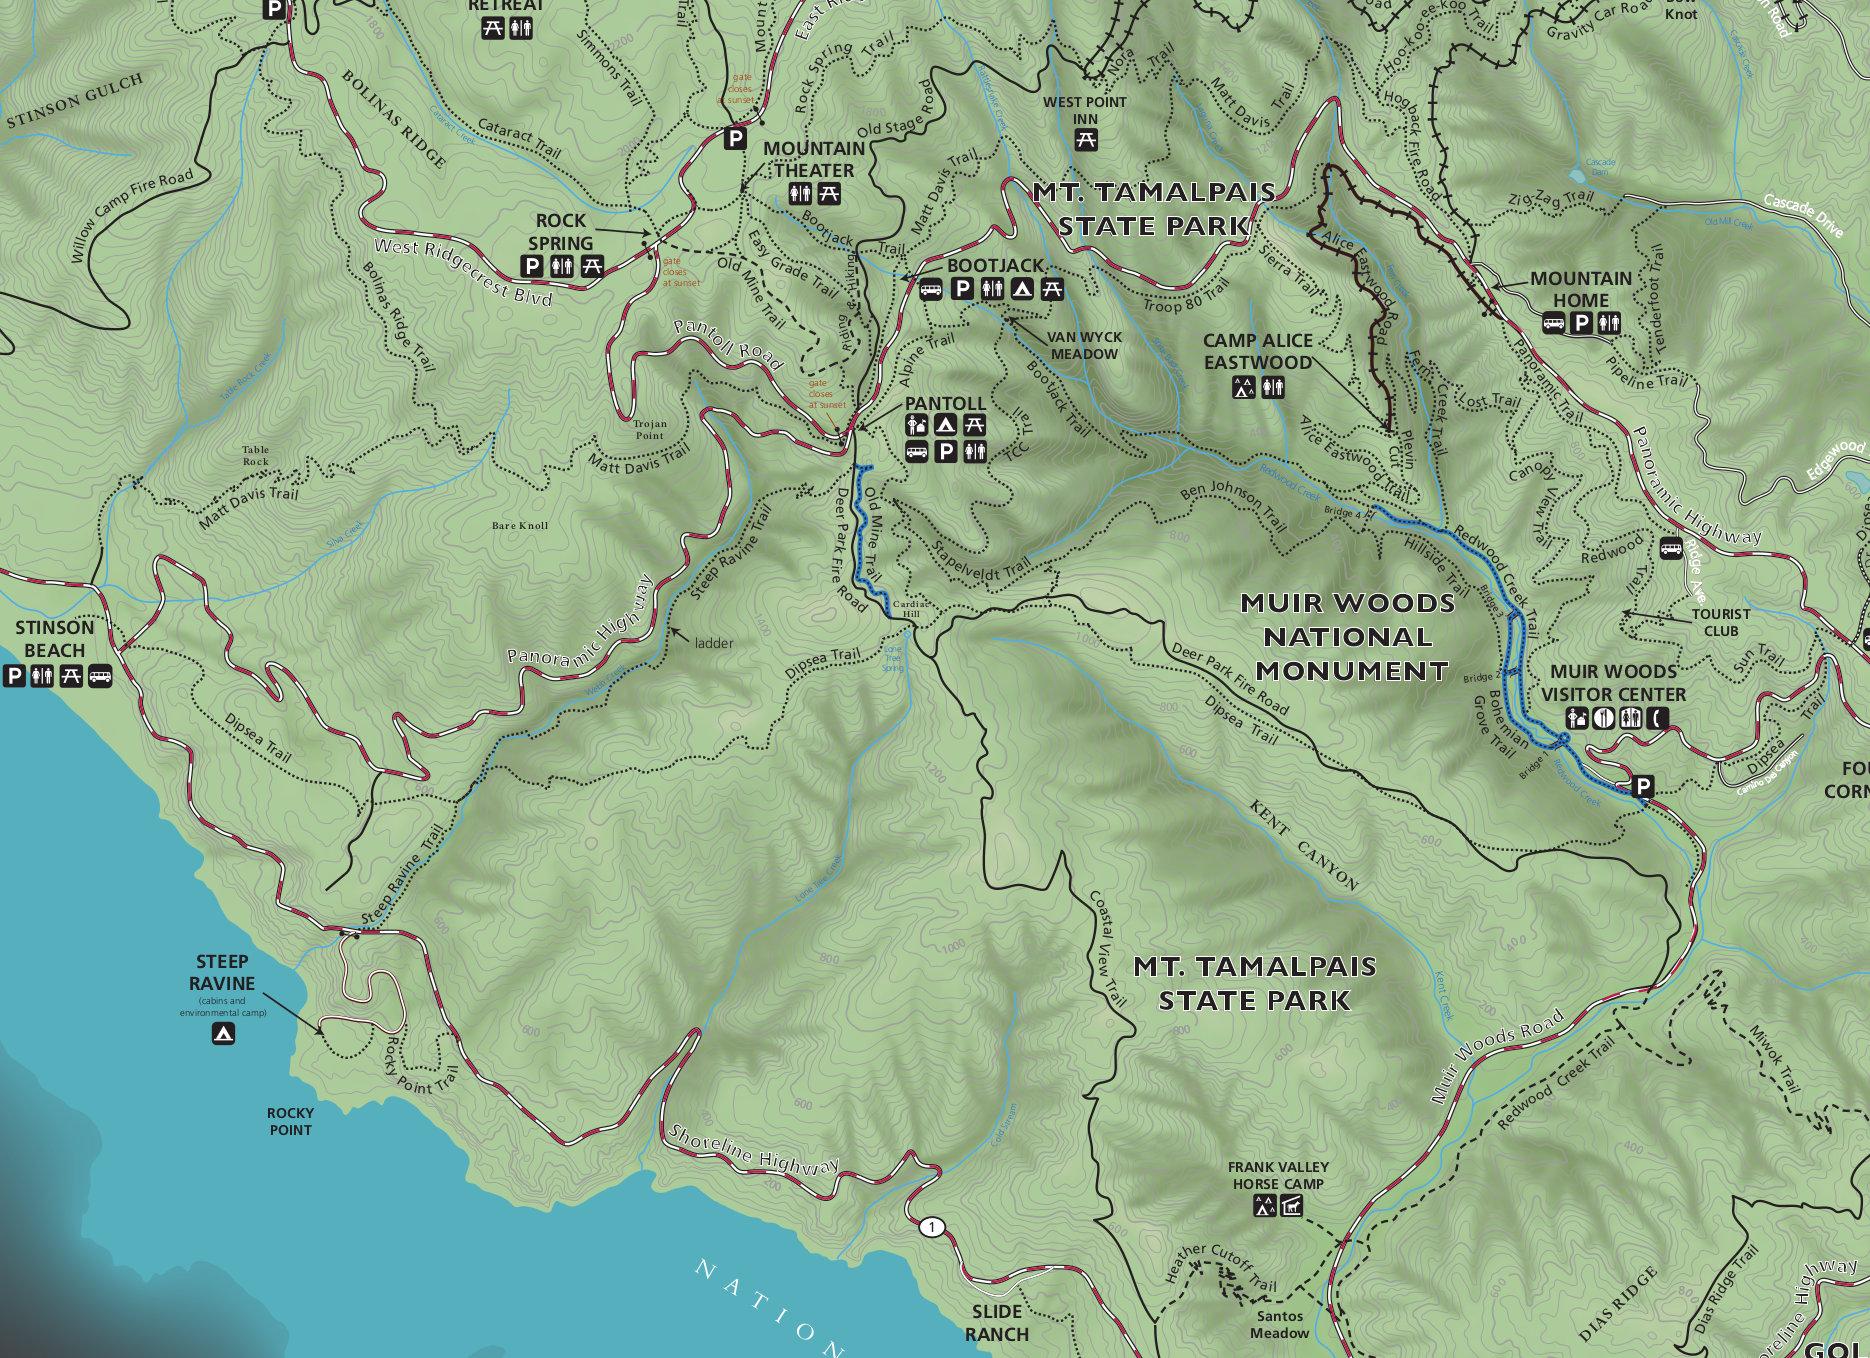 File:NPS muir-woods-trail-topographic-map jpg - Wikimedia